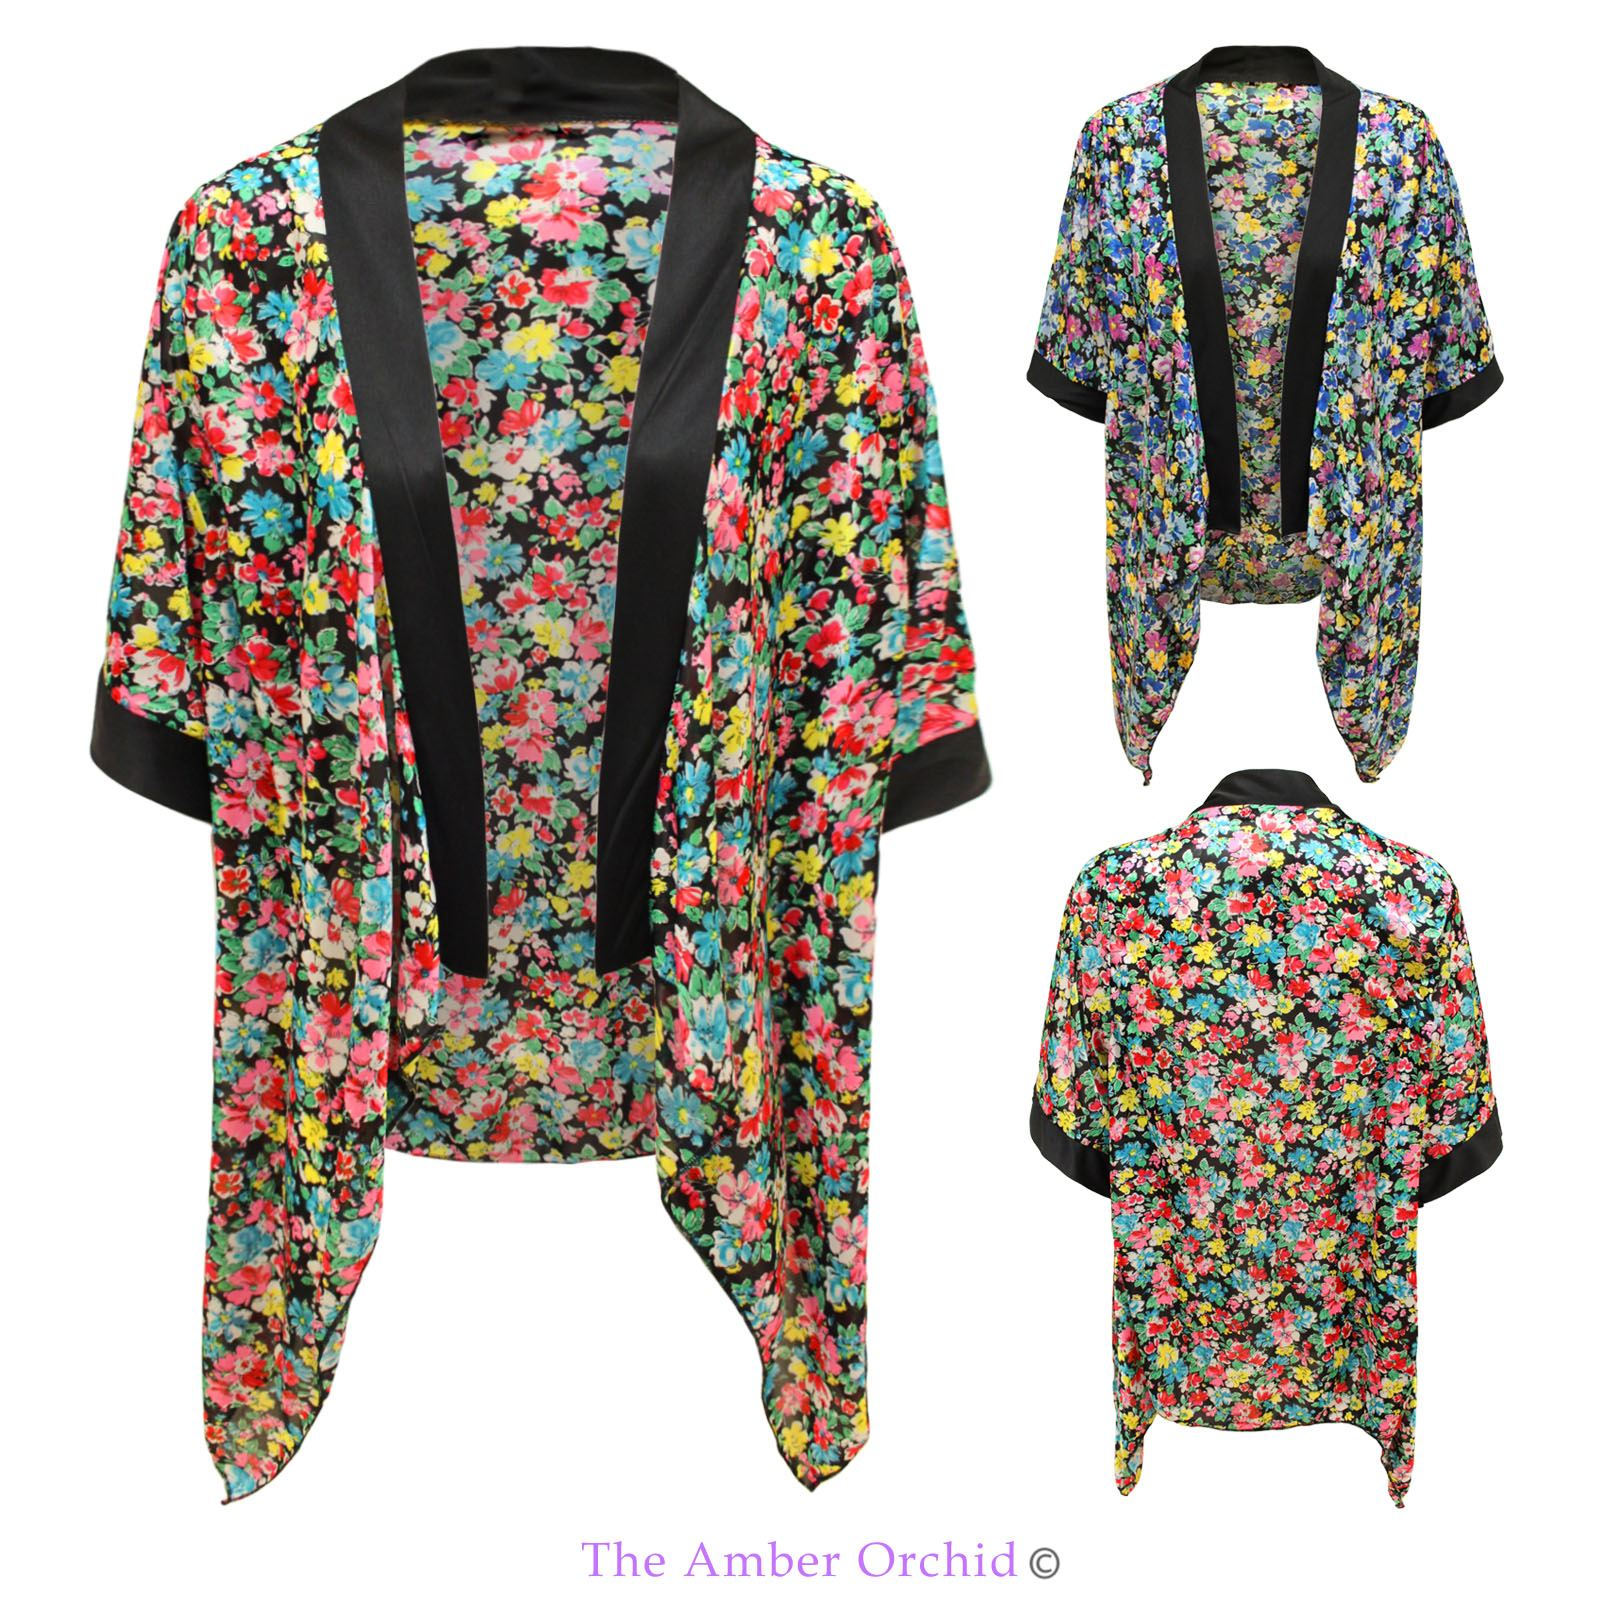 Damen blumenmuster kimono vintage top umhang offene for Kimono jacke damen